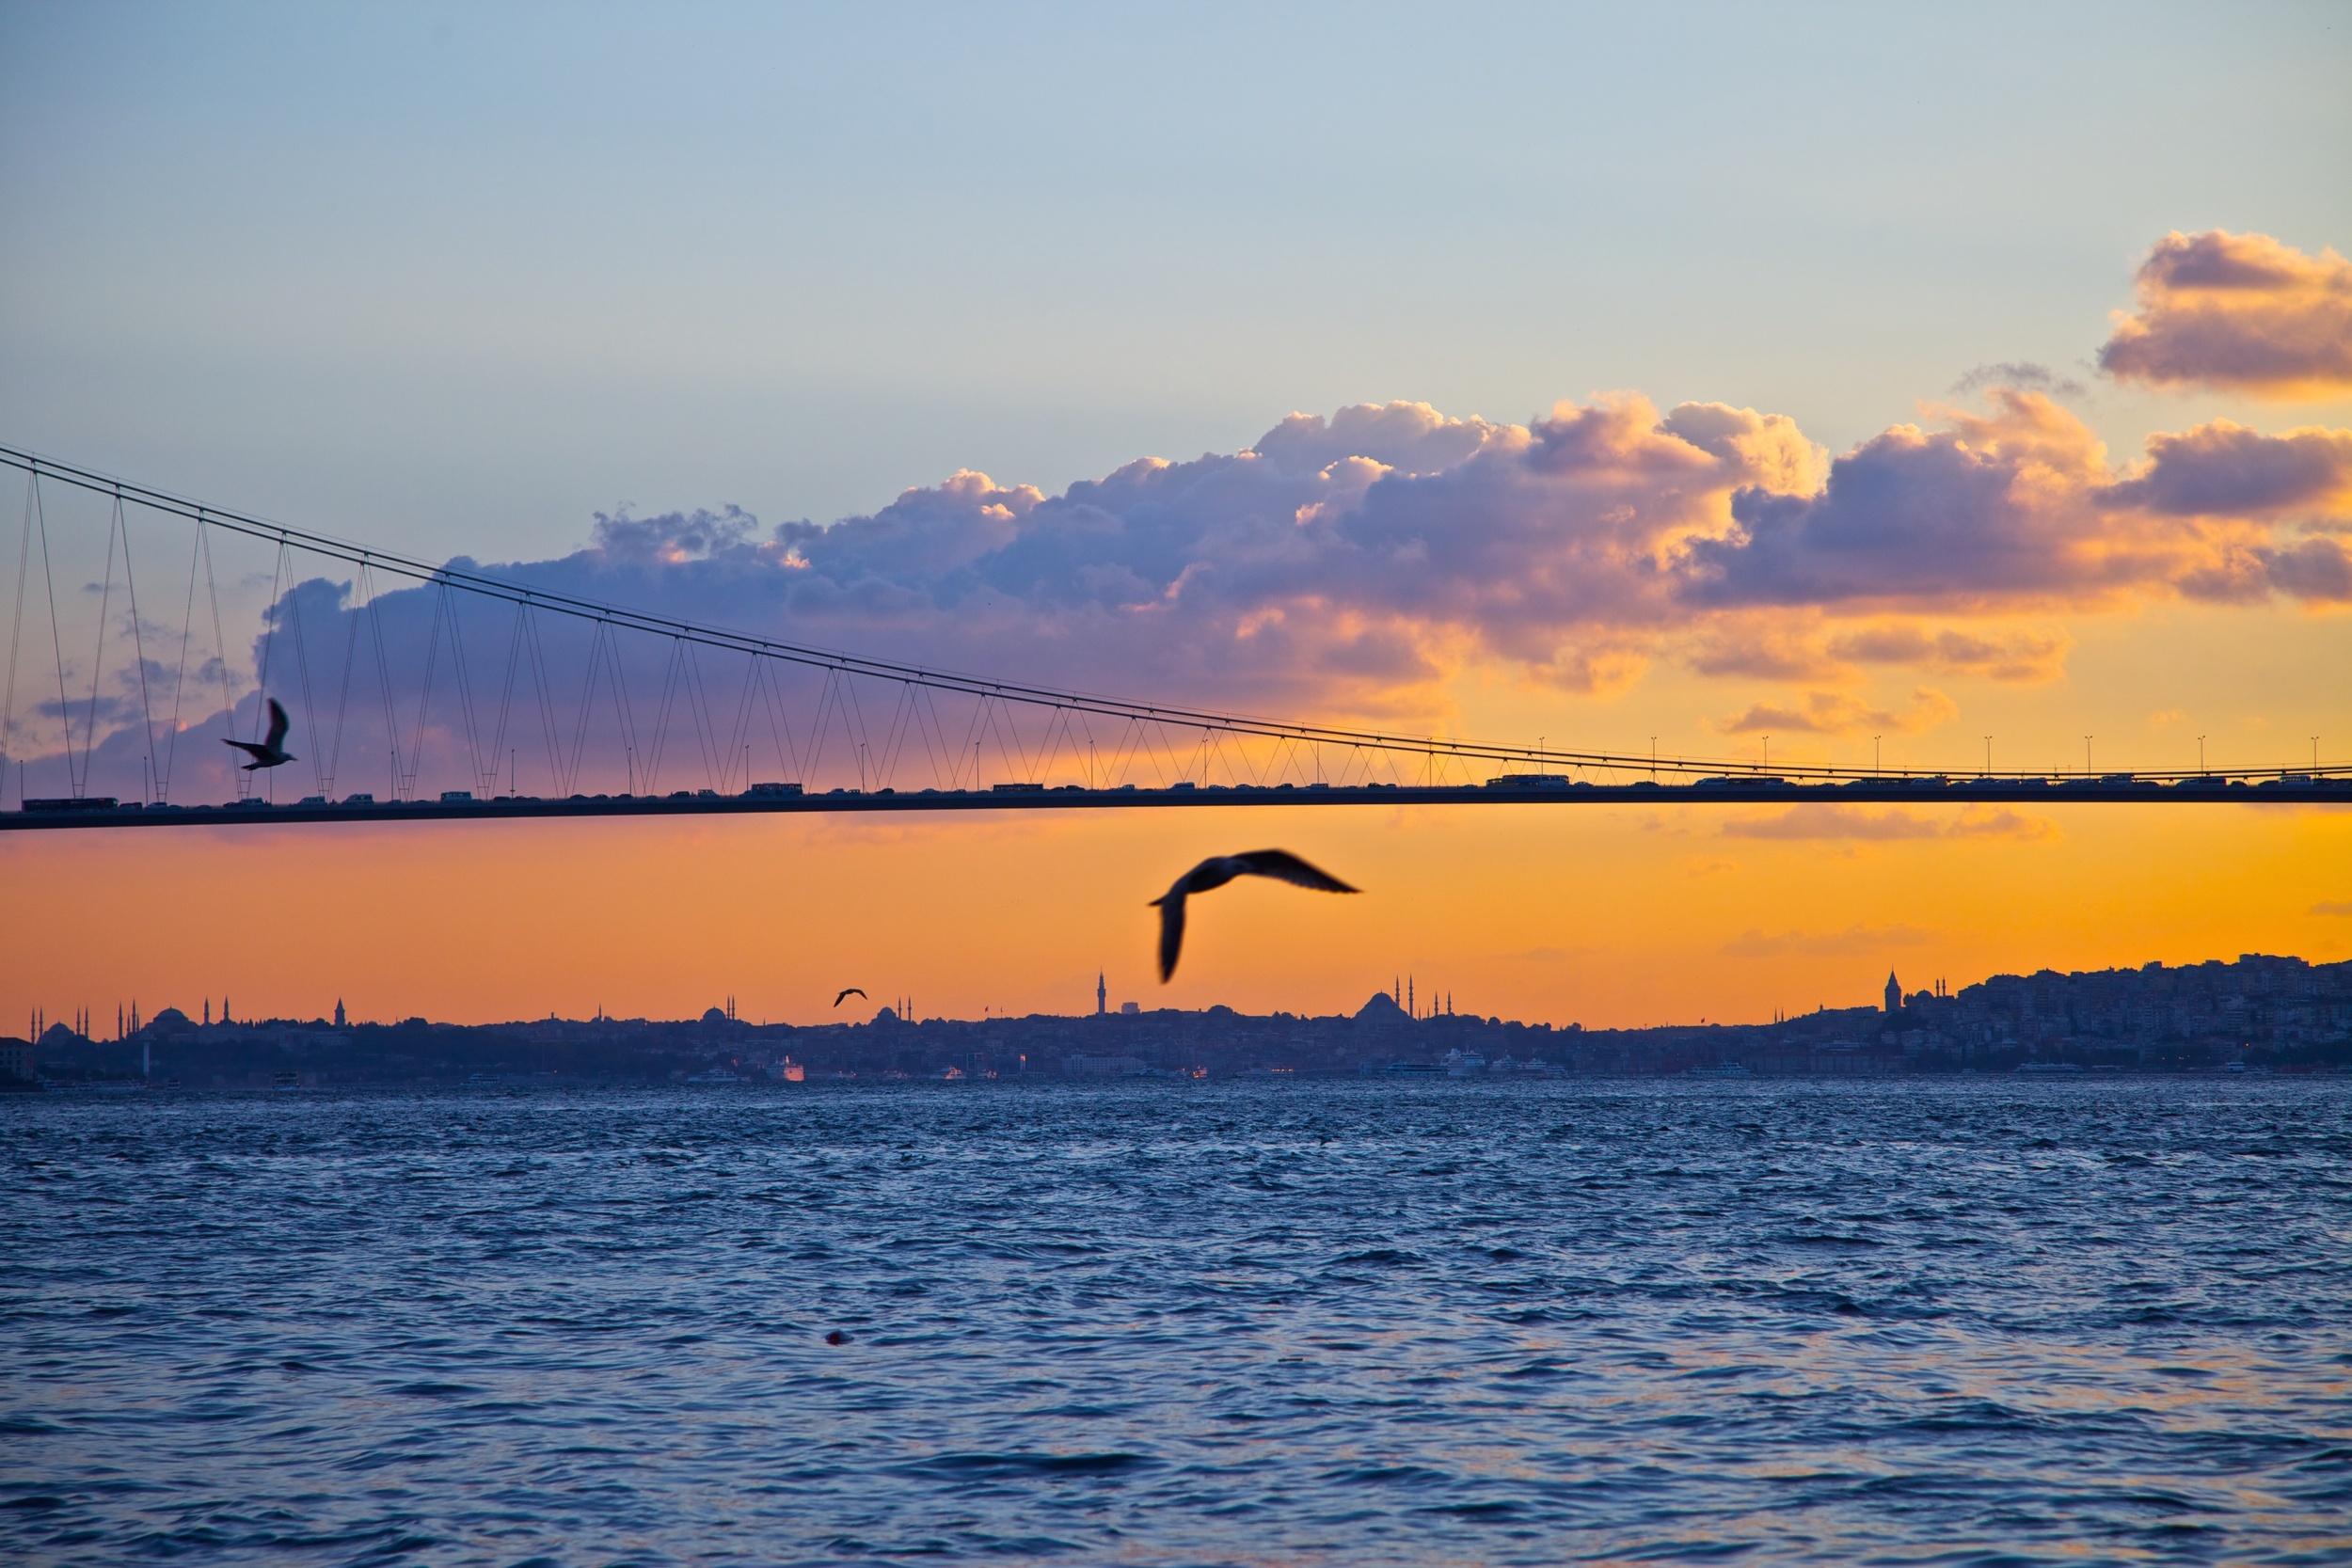 The Bosphorus Bridge, connecting Europe and Asia. Istanbul, Turkey..